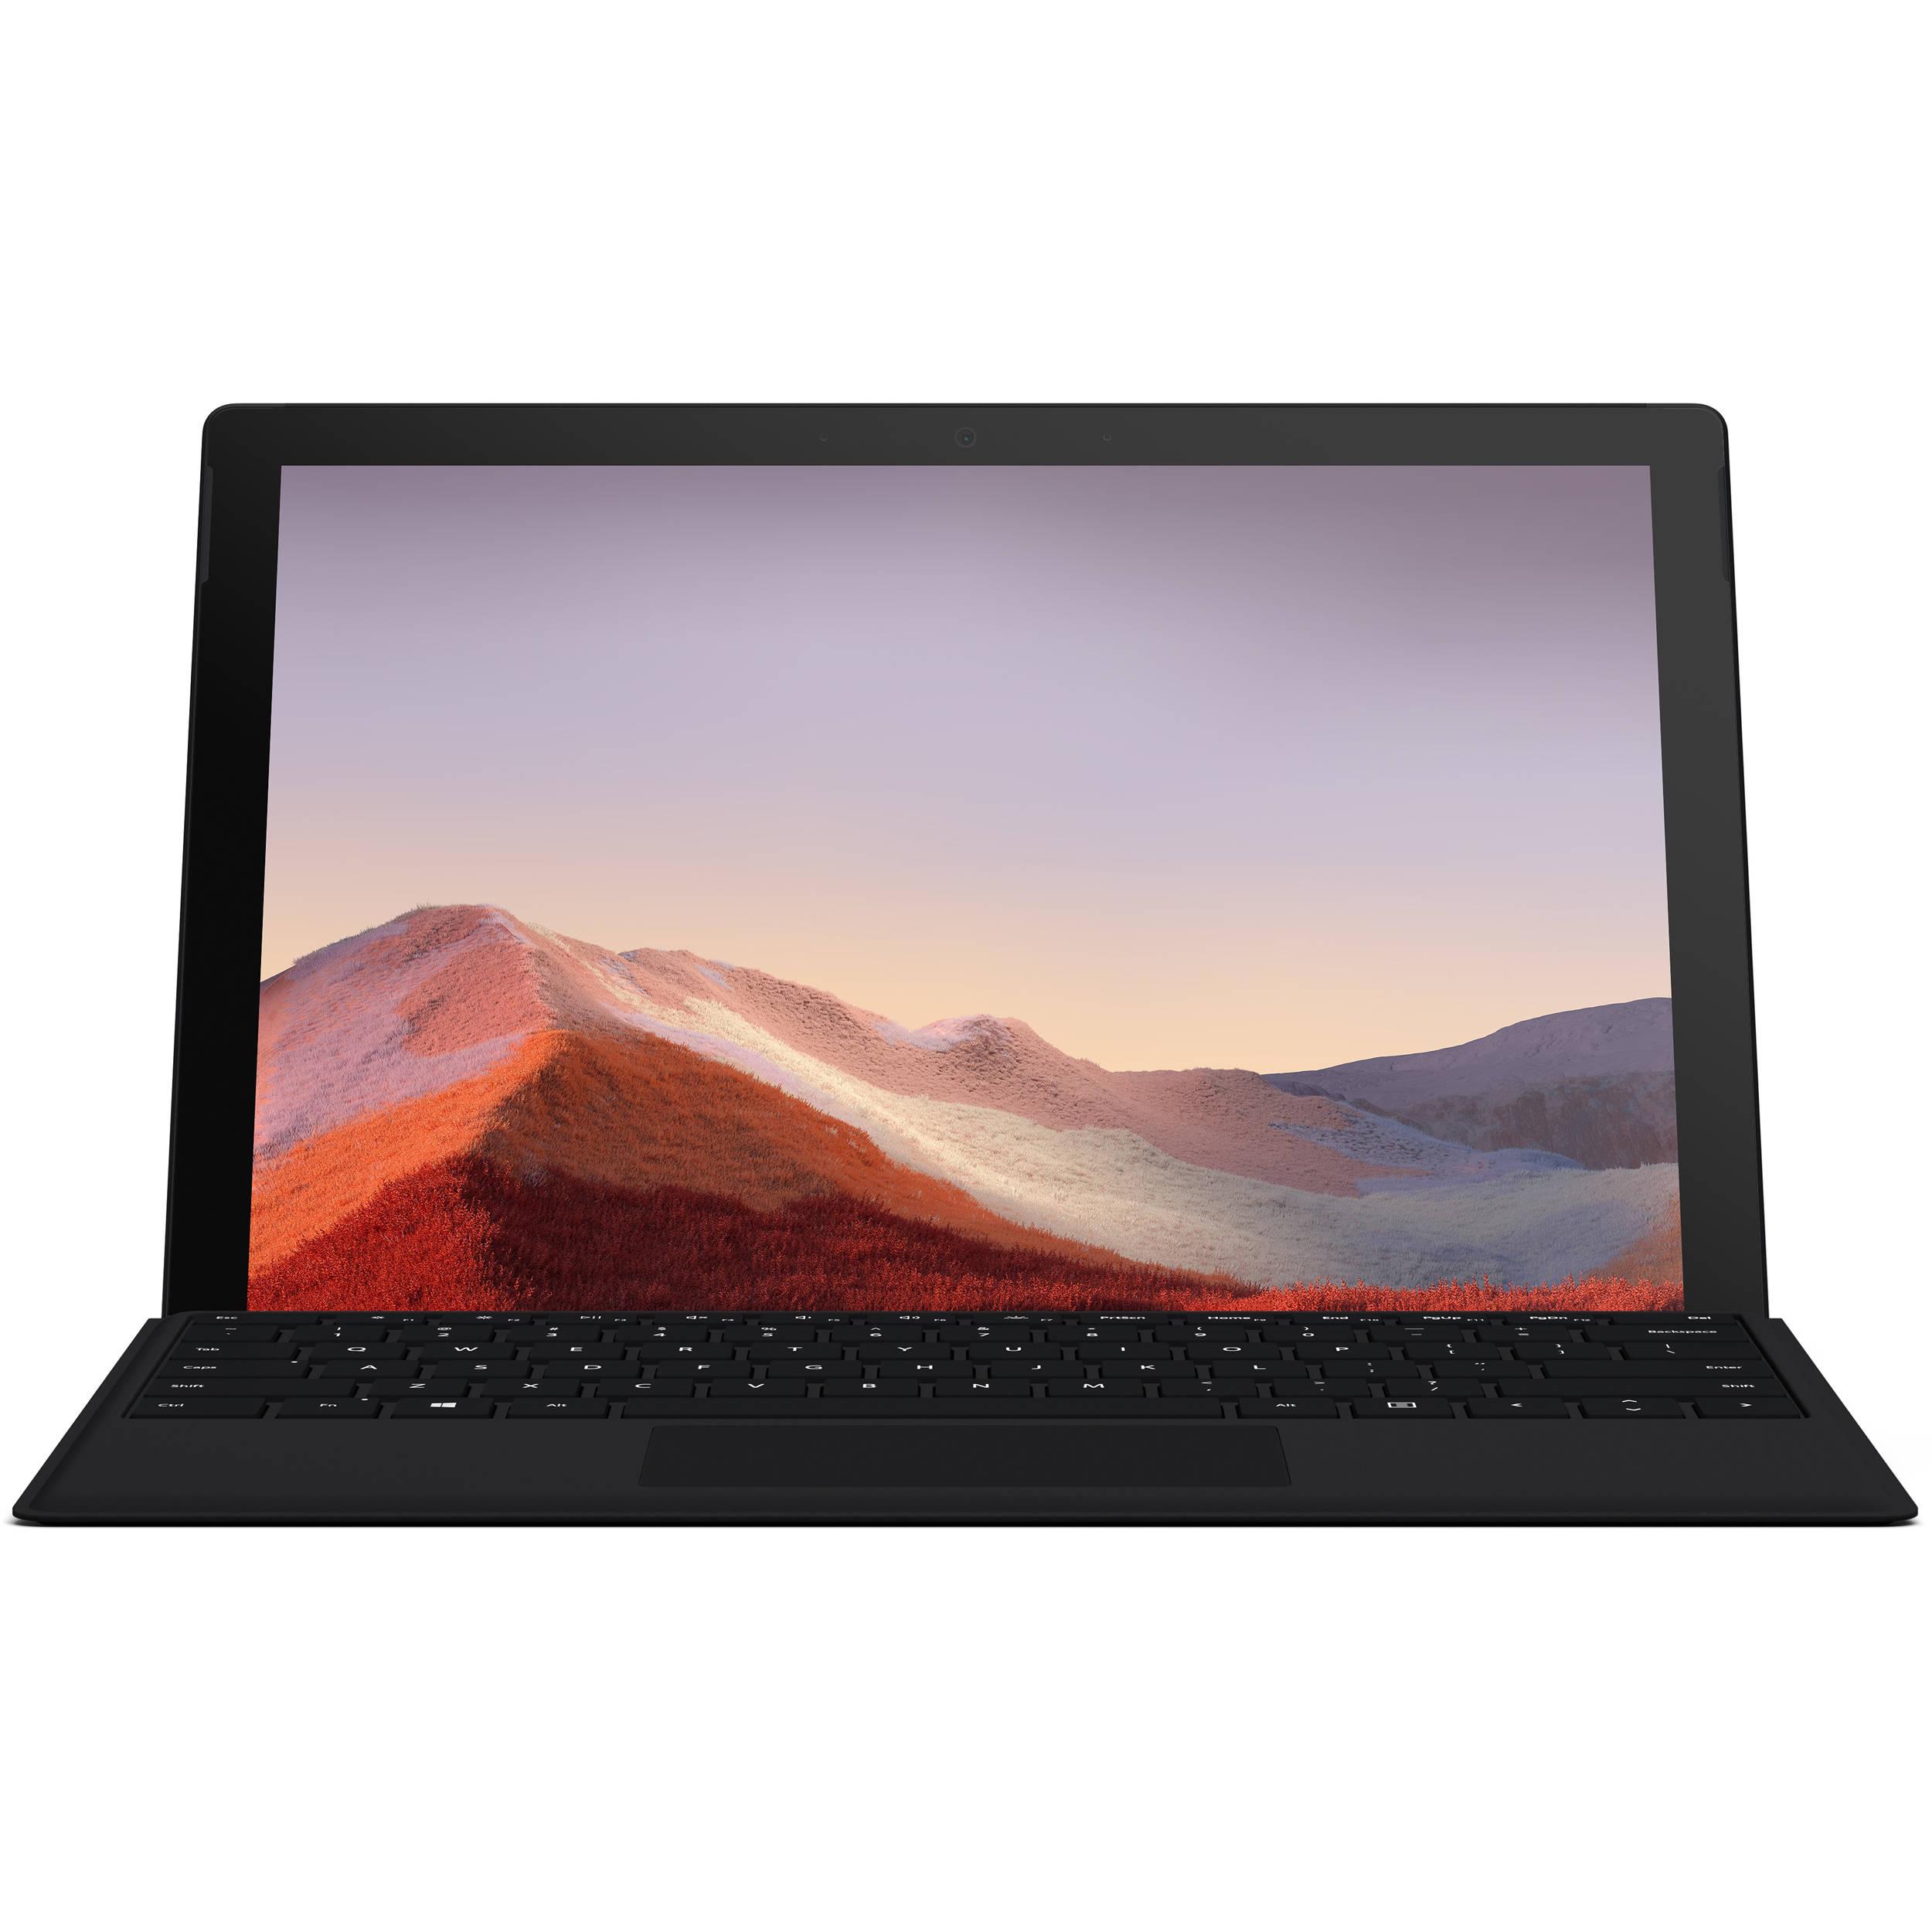 فروش نقدی و اقساطی تبلت مایکروسافت مدل Surface Pro 7 - G به همراه کیبورد Black Type Cover